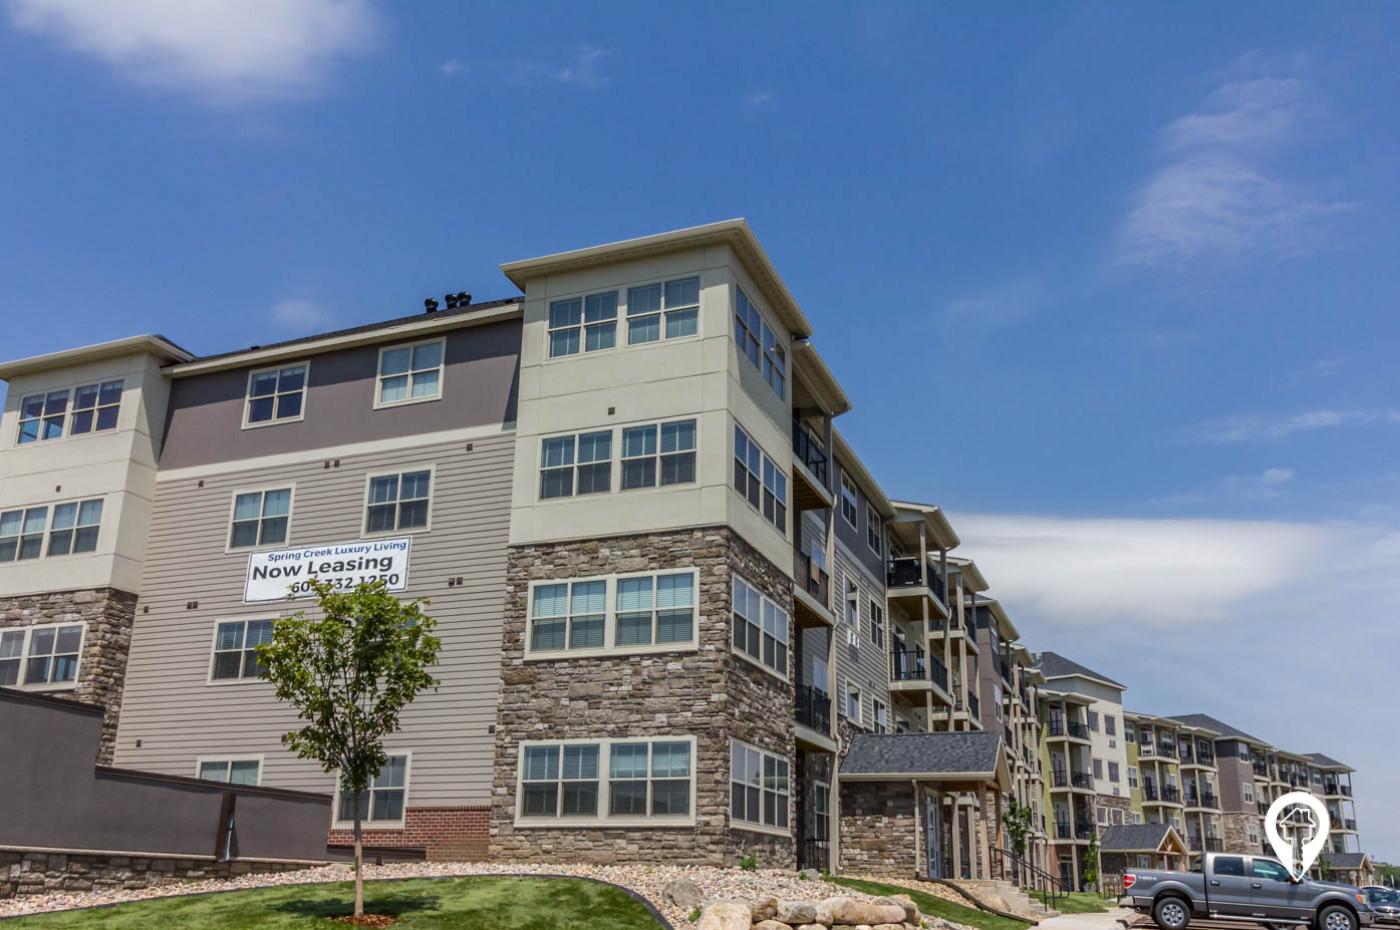 Samuelson Development - Spring Creek Luxury Apartments